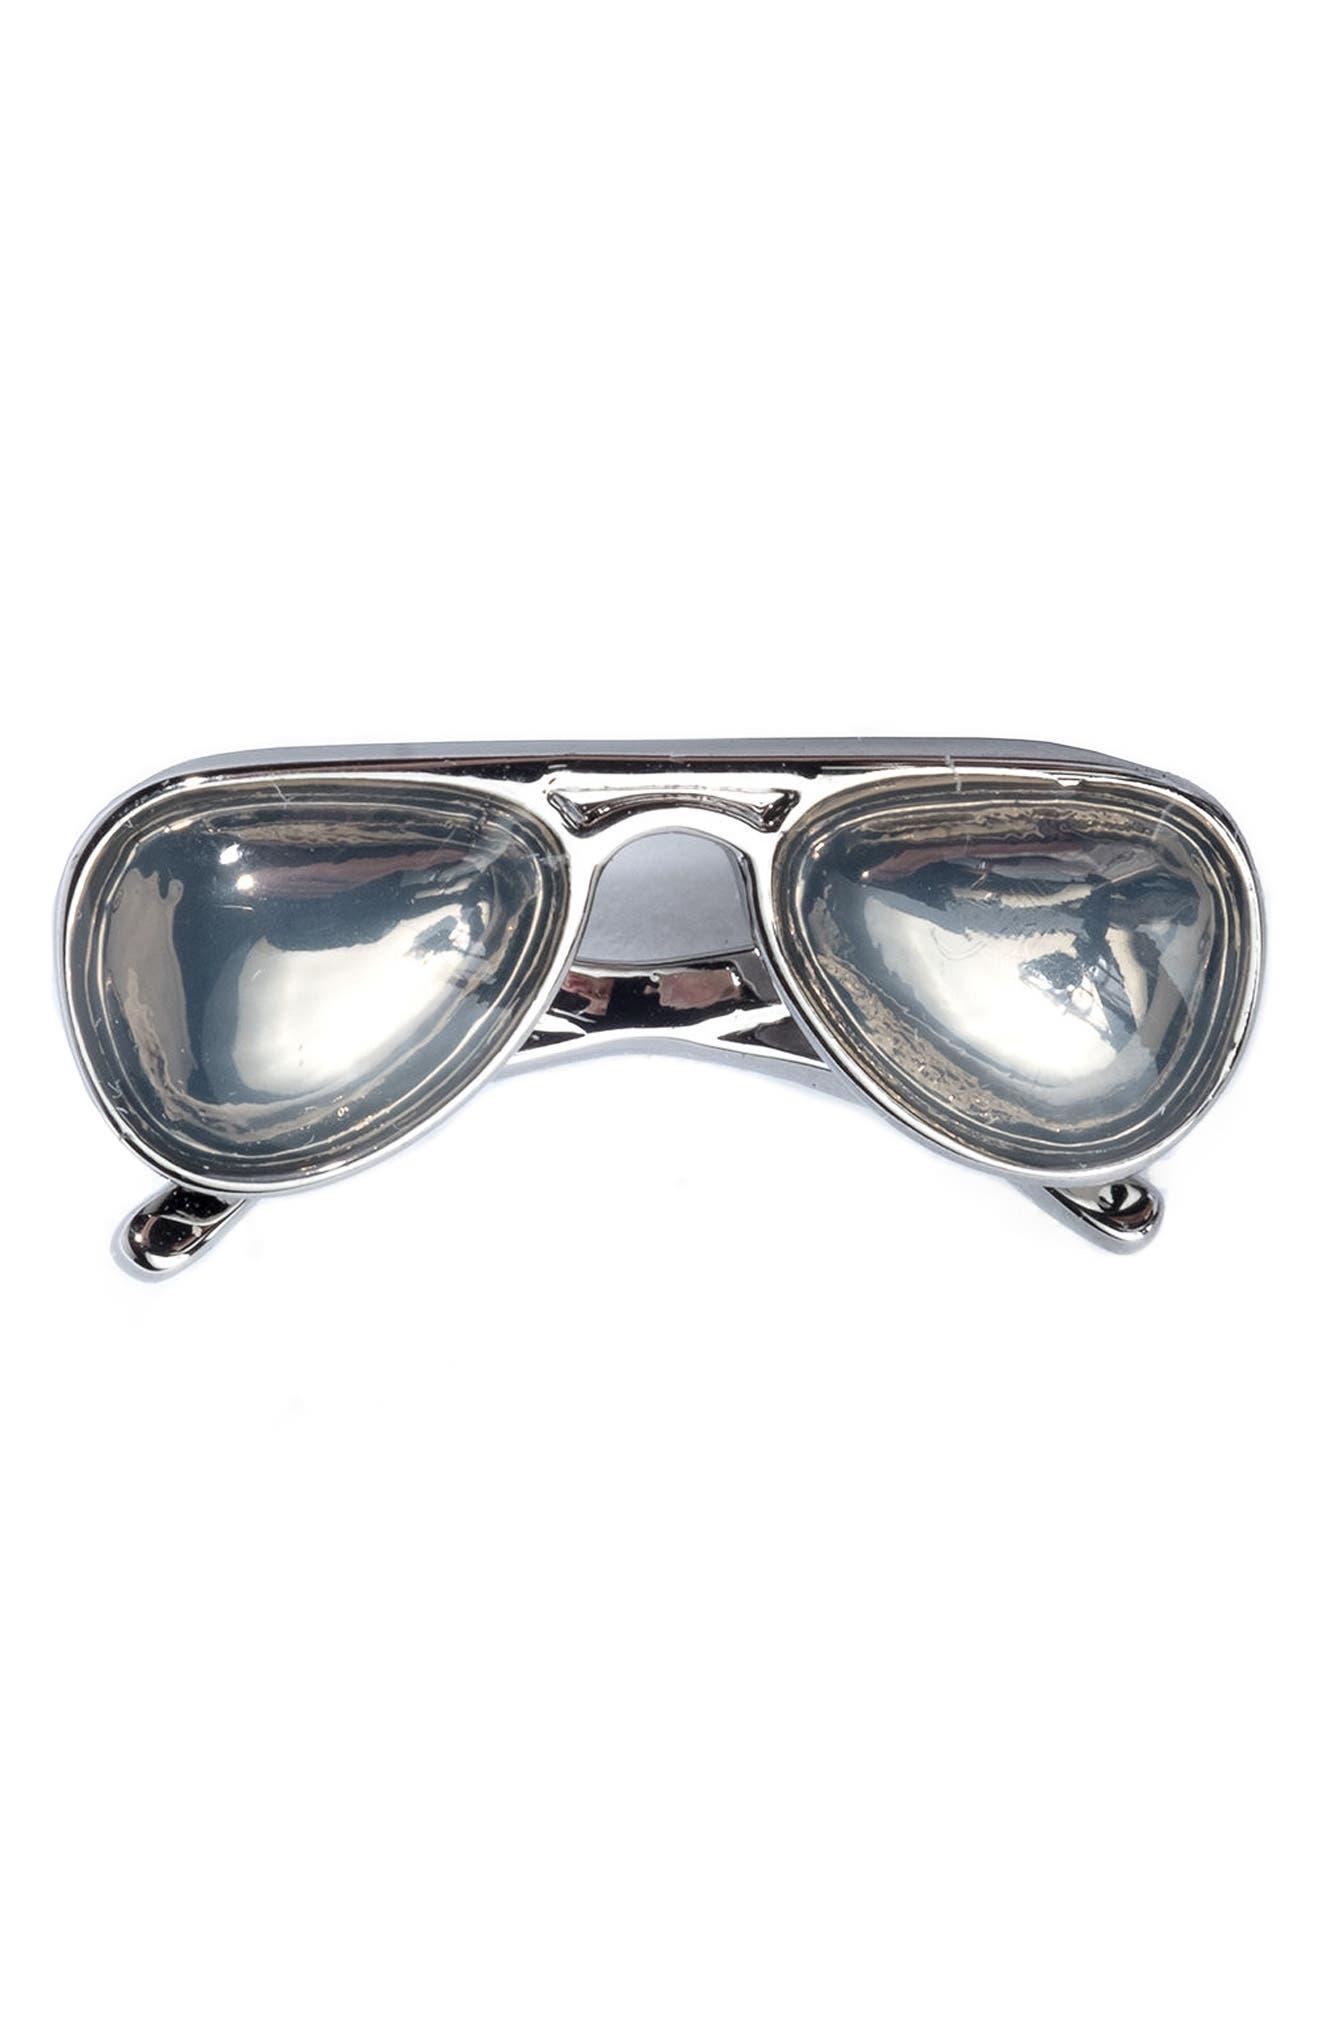 Sunglasses Lapel Pin,                             Main thumbnail 1, color,                             Silver